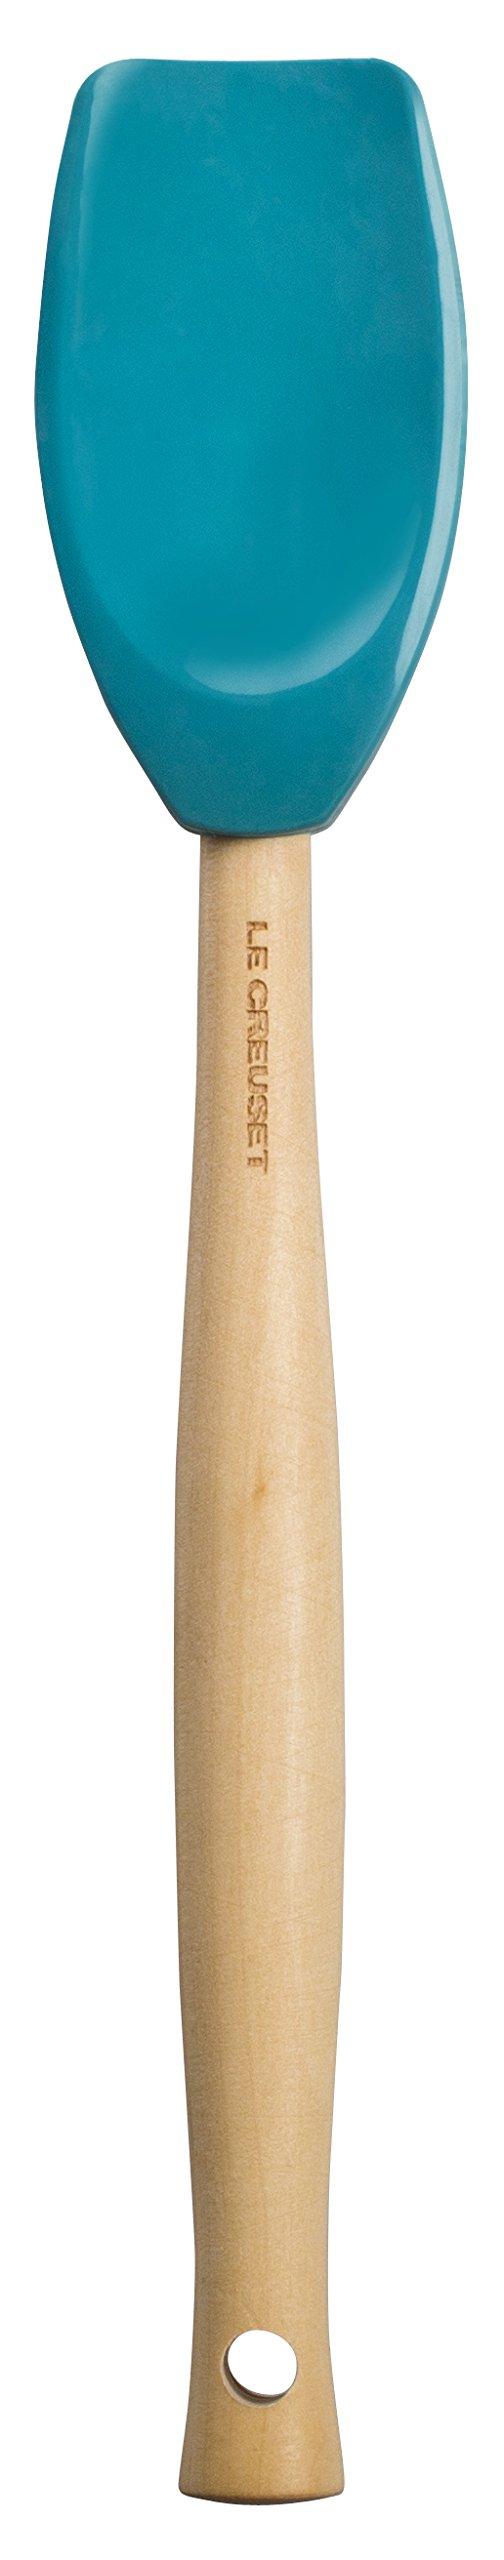 "Le Creuset JS420-17 Craft Series Spatula Spoon, 11 3/8"" x 2 1/8"", Caribbean"